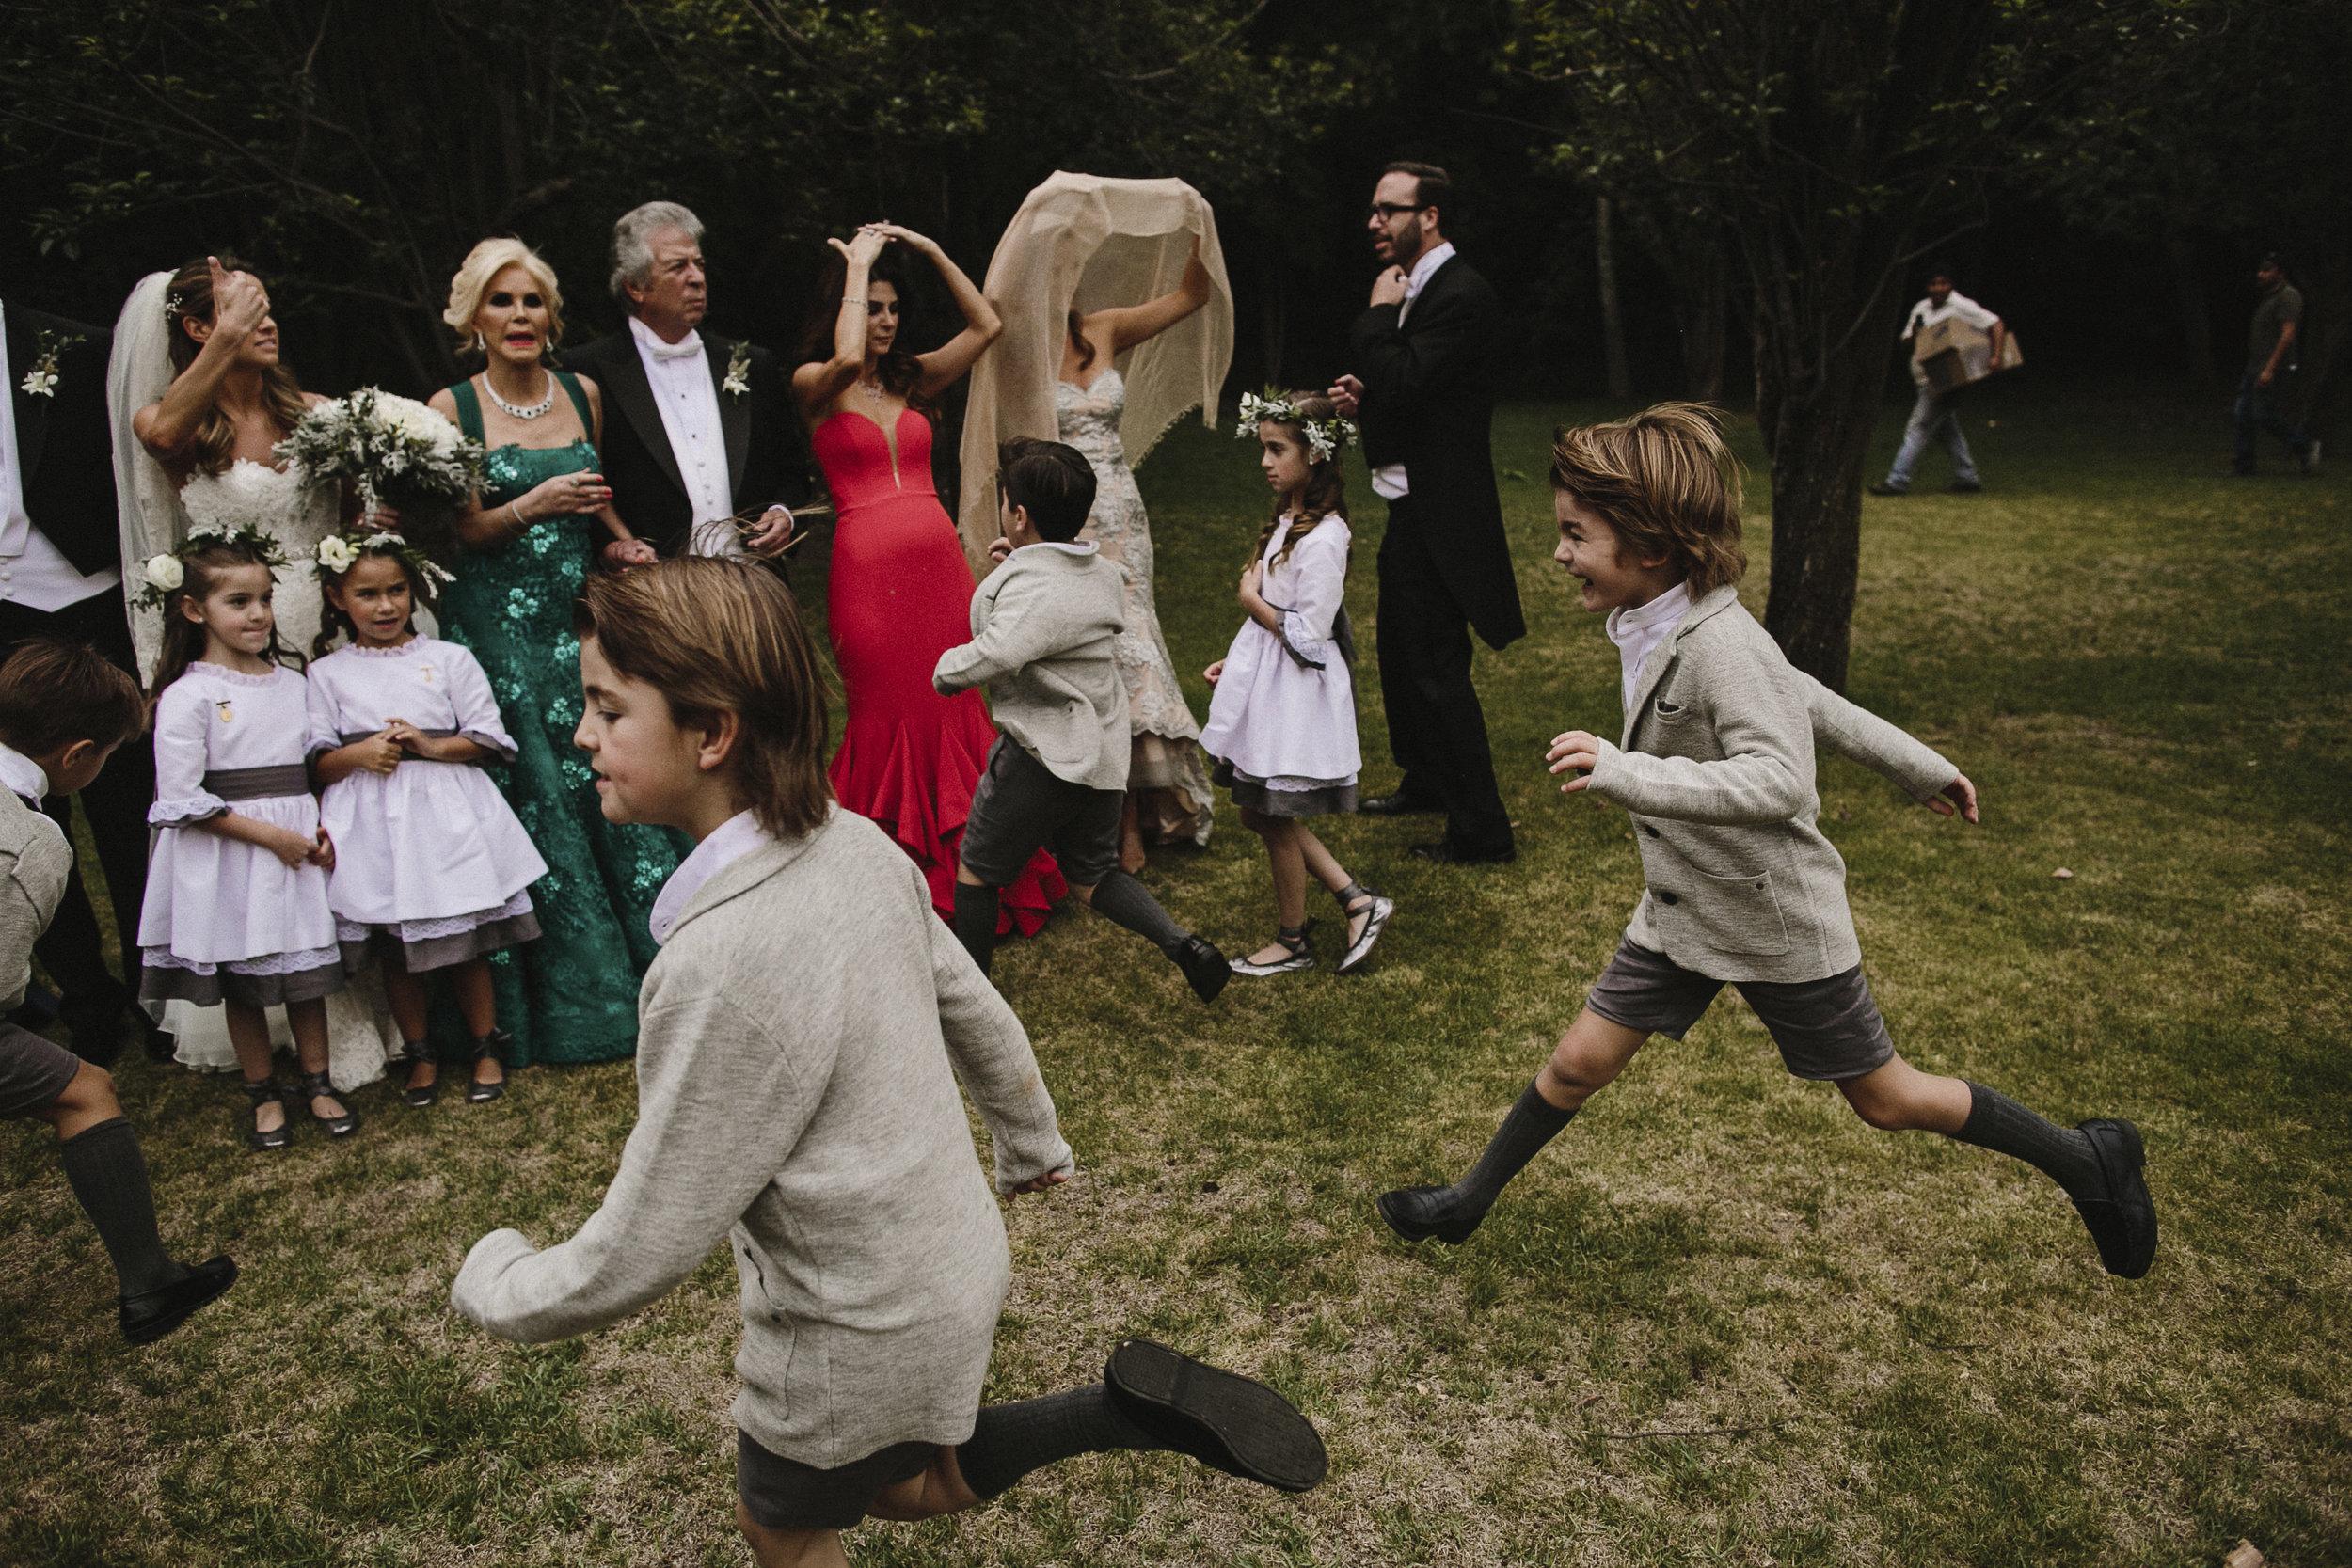 alfonso_flores_destination_wedding_photogrpahy_paola_alonso-217.JPG